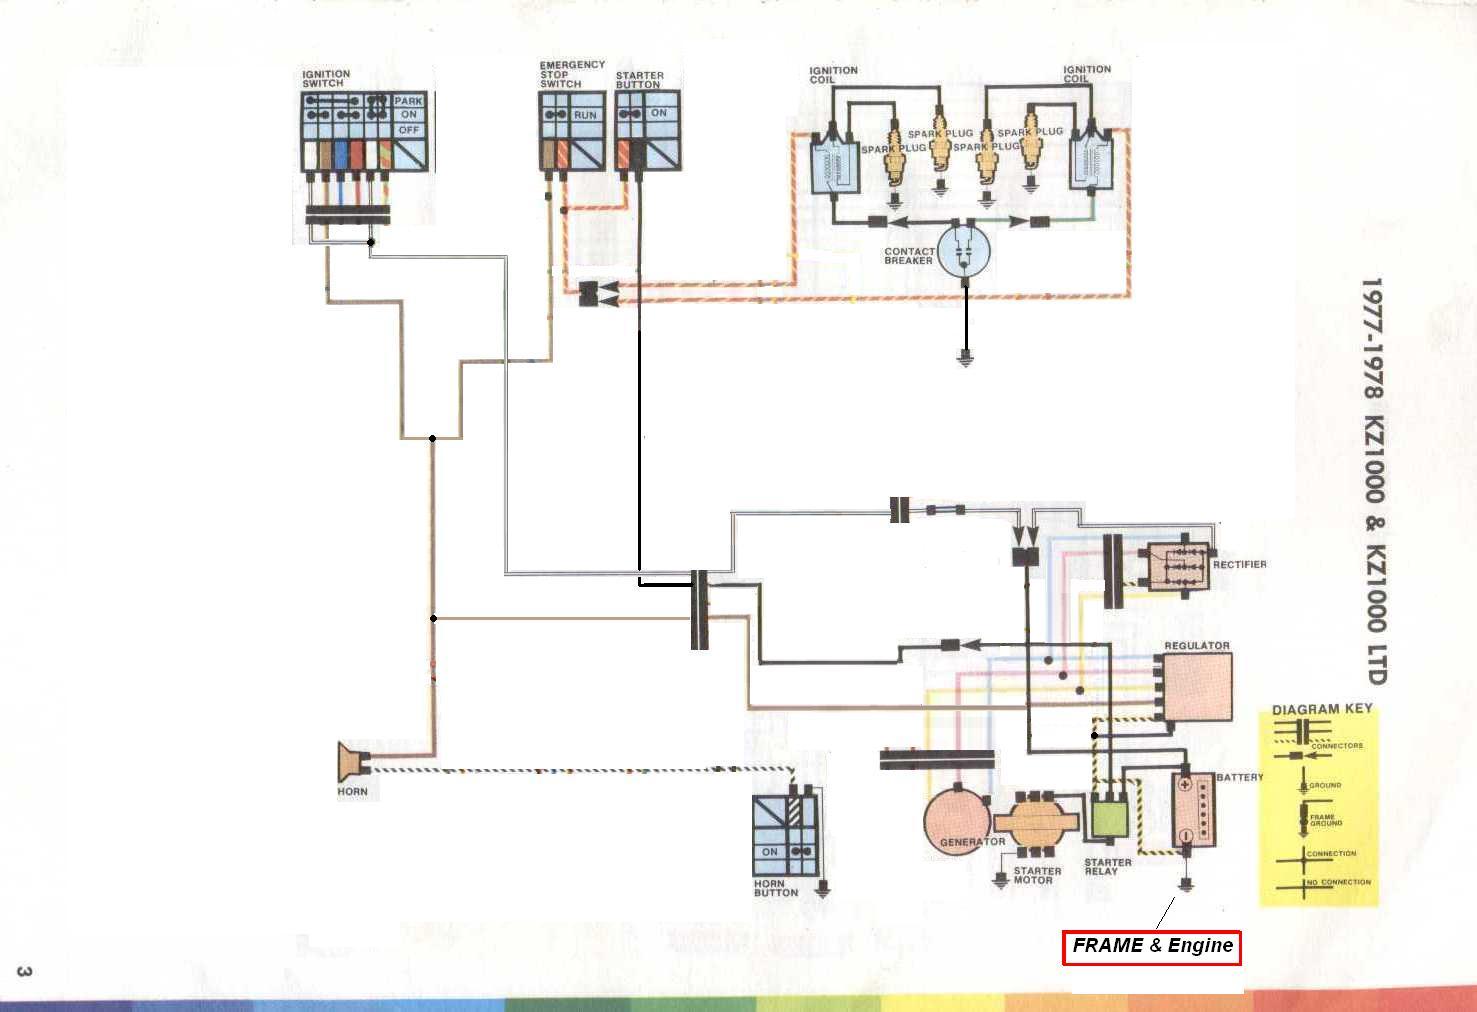 2008 Goldwing Wiring Diagram | Online Wiring Diagram on 2002 honda civic ignition diagram, goldwing 1100 clutch diagram, honda valkyrie carburetor diagram, 1988 honda goldwing carbuator diagram, 83 aspencade radio diagram, 1978 honda gl1000 parts diagram, 1992 honda accord coil diagram,